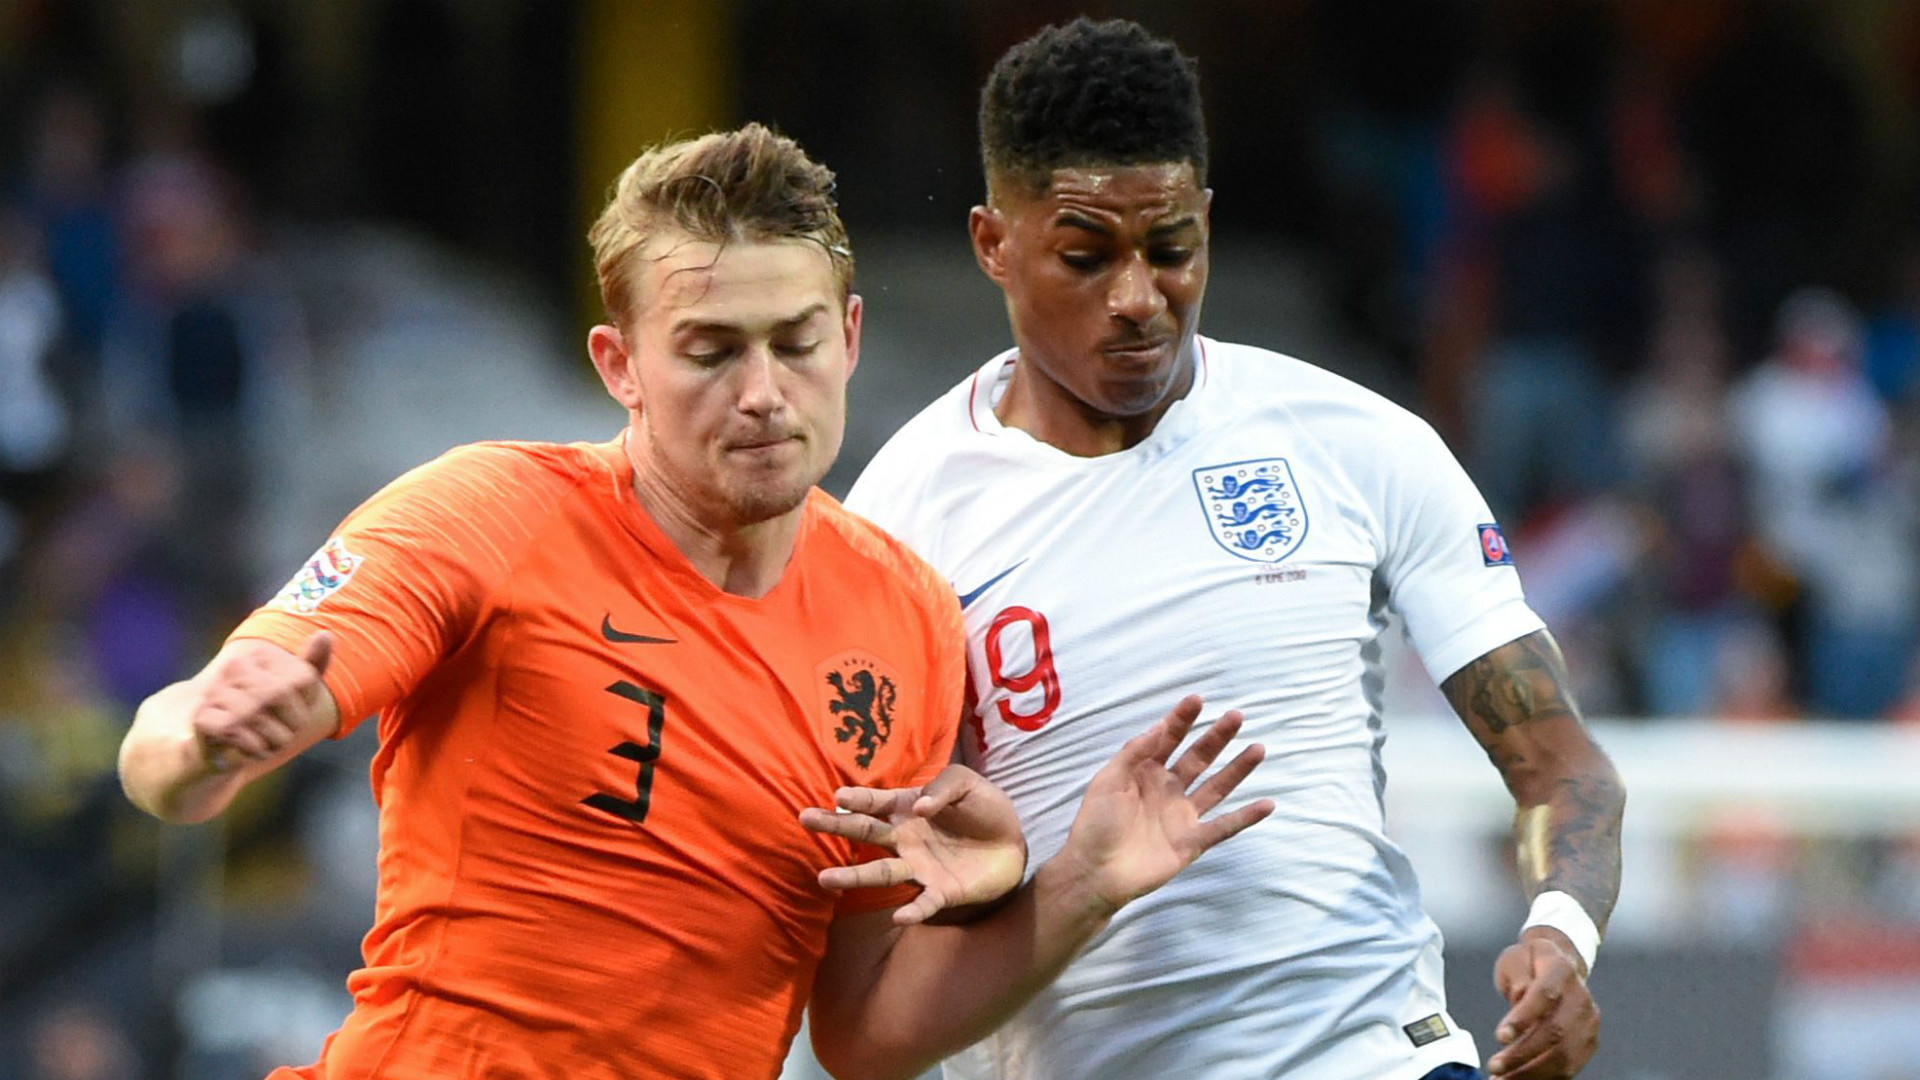 Matthijs de Ligt Marcus Rashford Netherlands England 2019